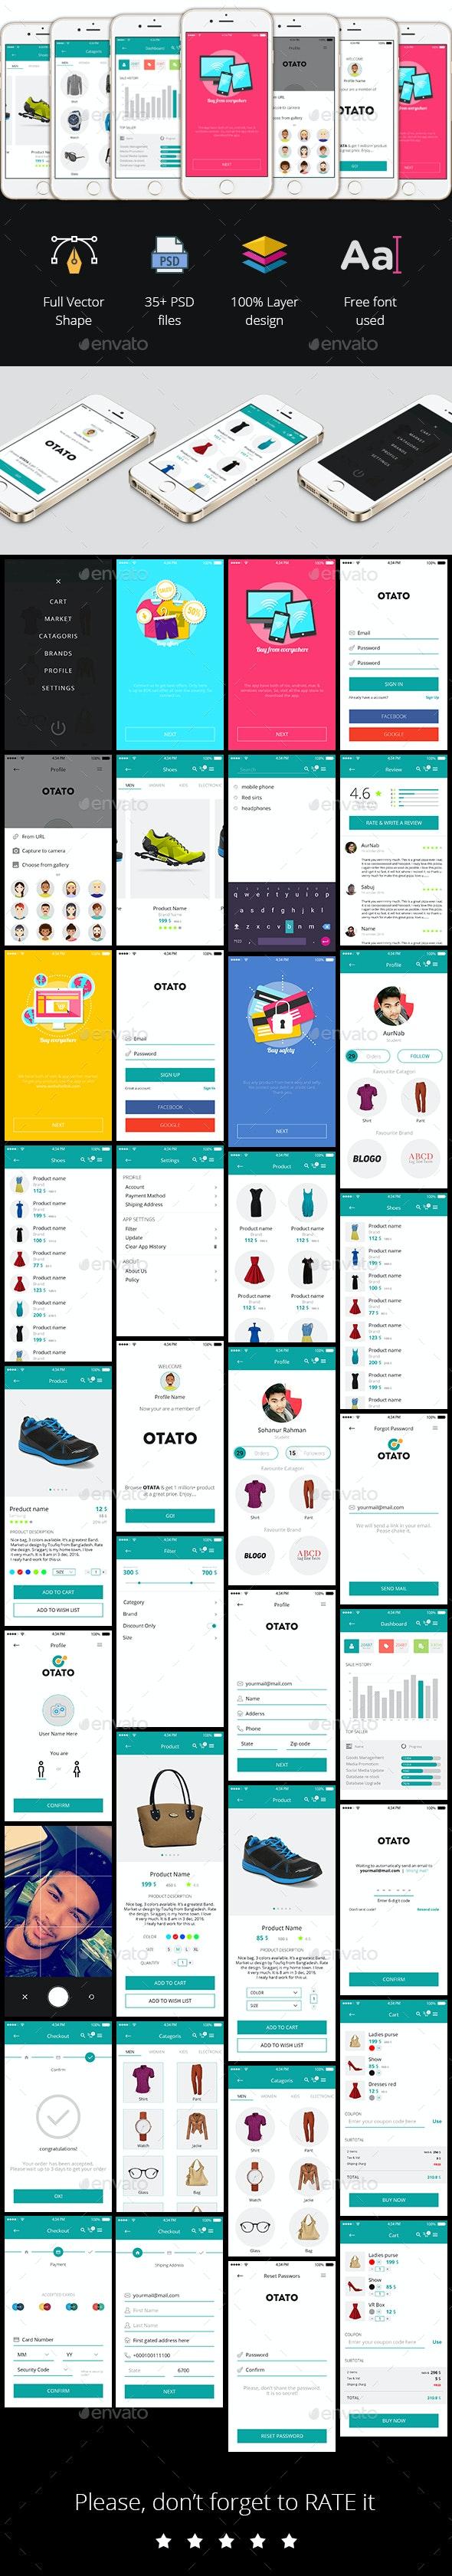 OTATO Shopping App UI - User Interfaces Web Elements